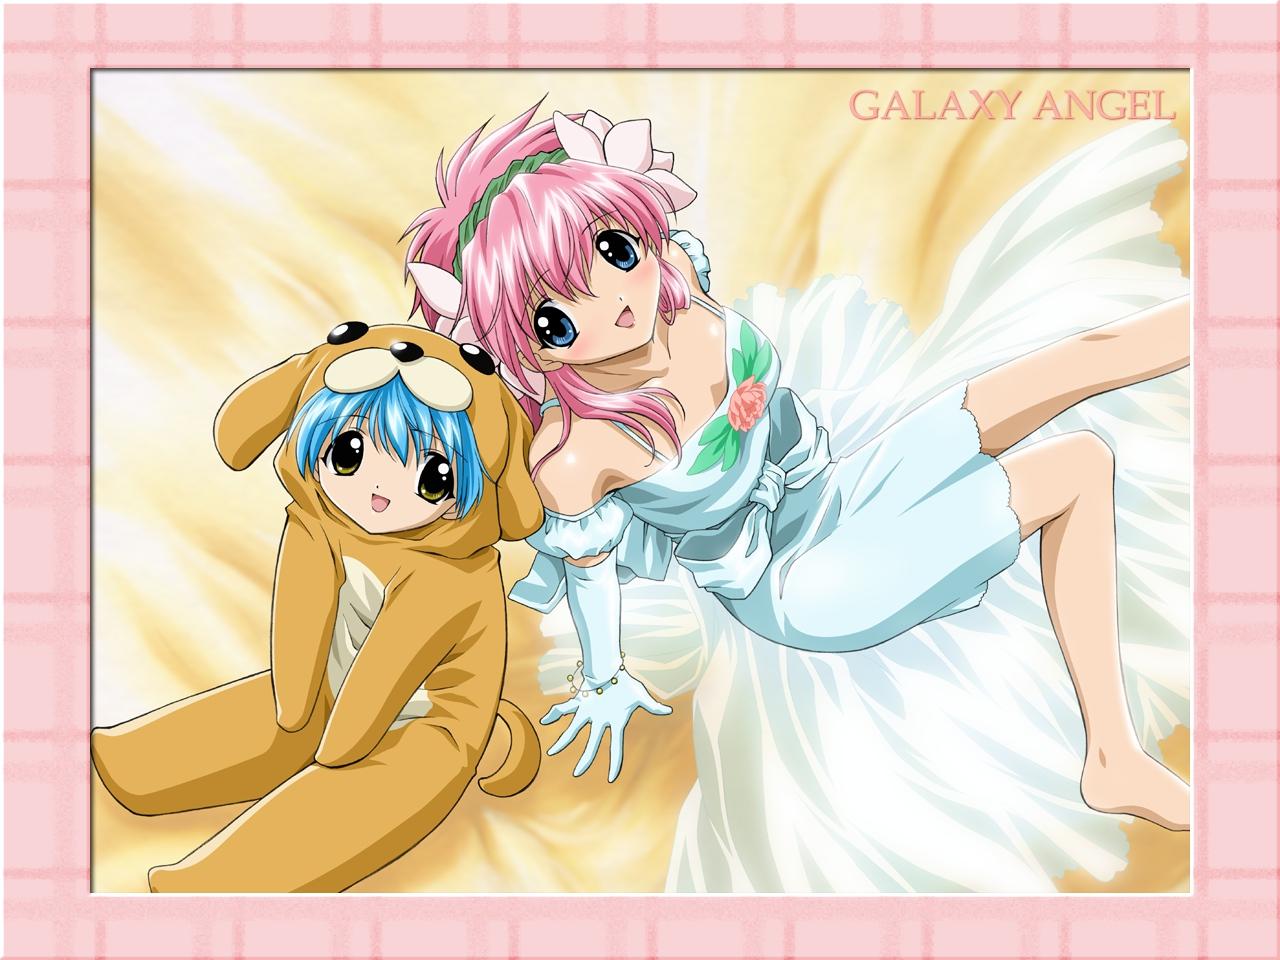 galaxy_angel milfeulle_sakuraba mint_blancmanche